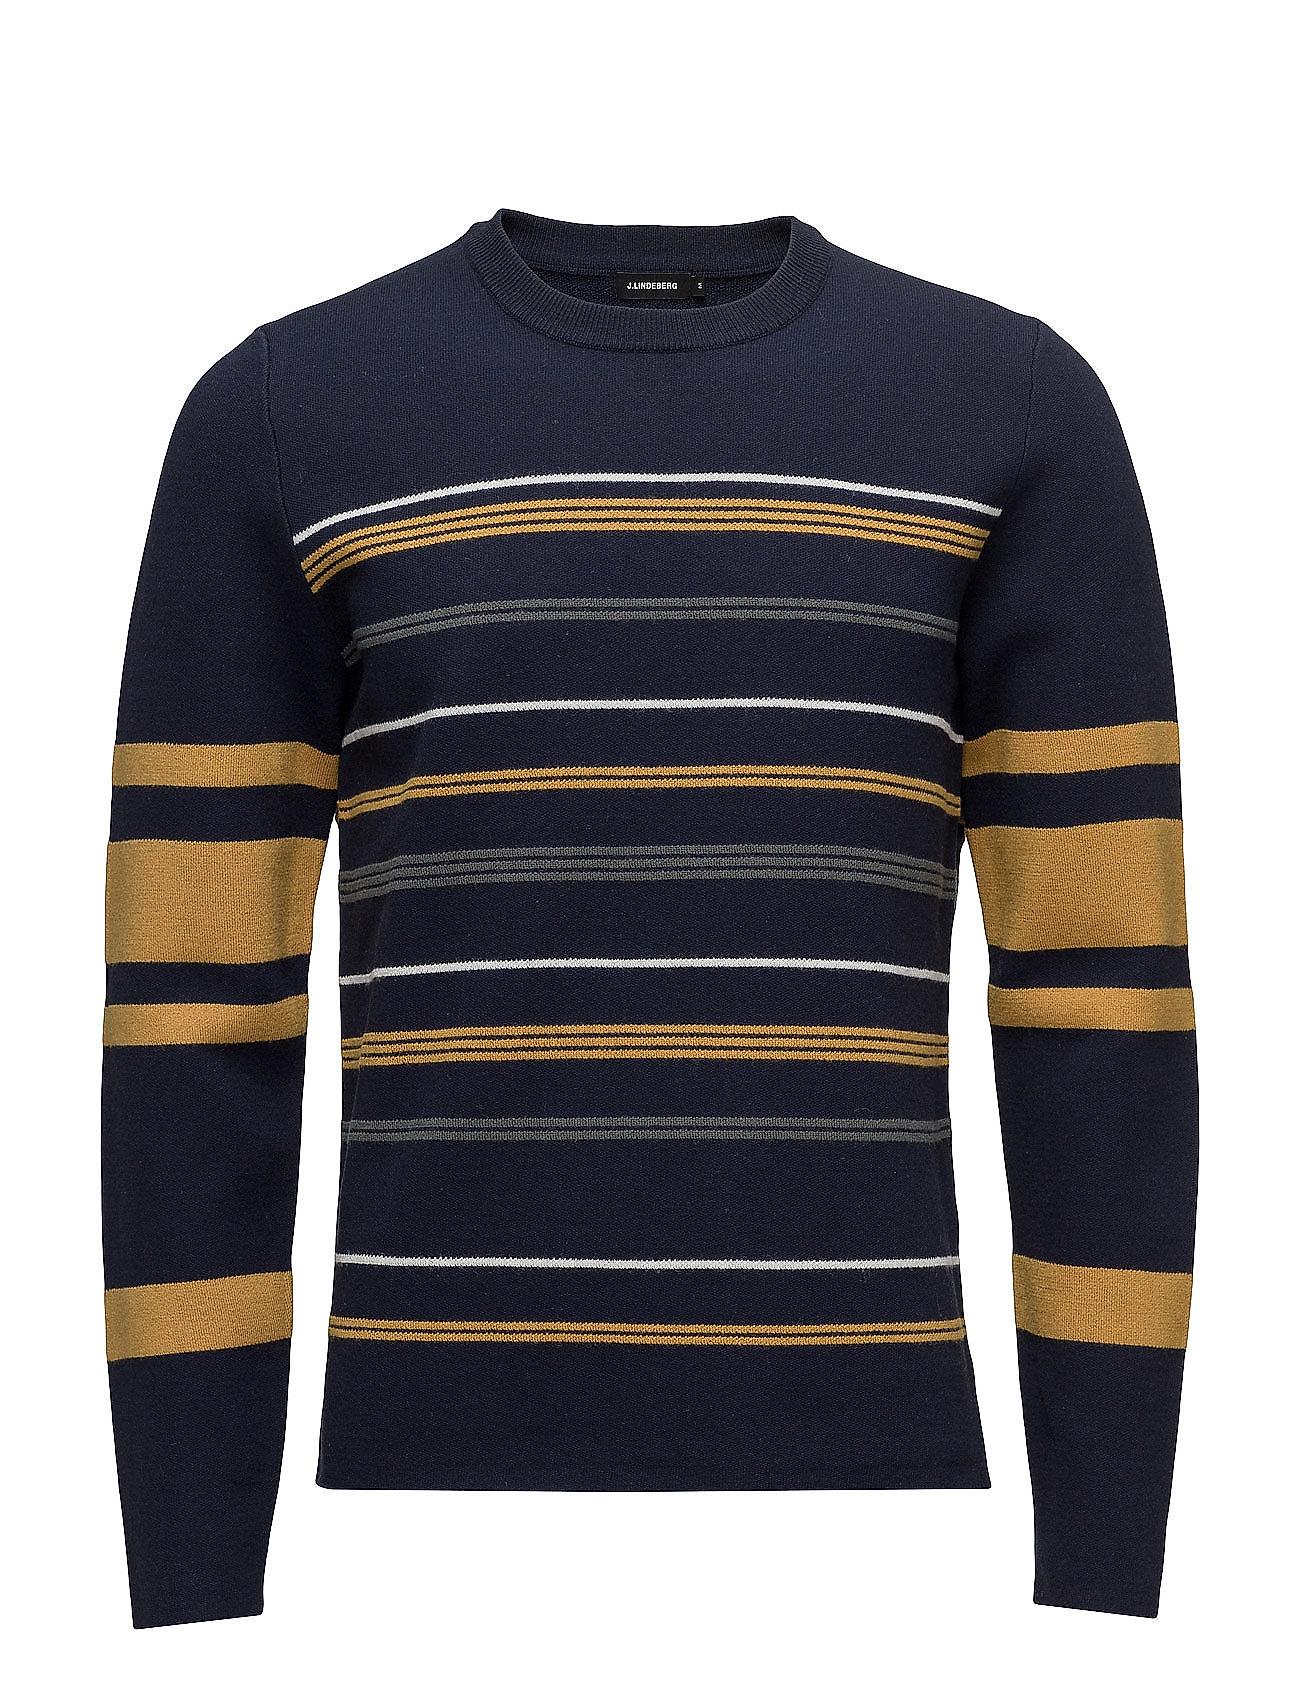 J. Lindeberg Sky Stripe Knit